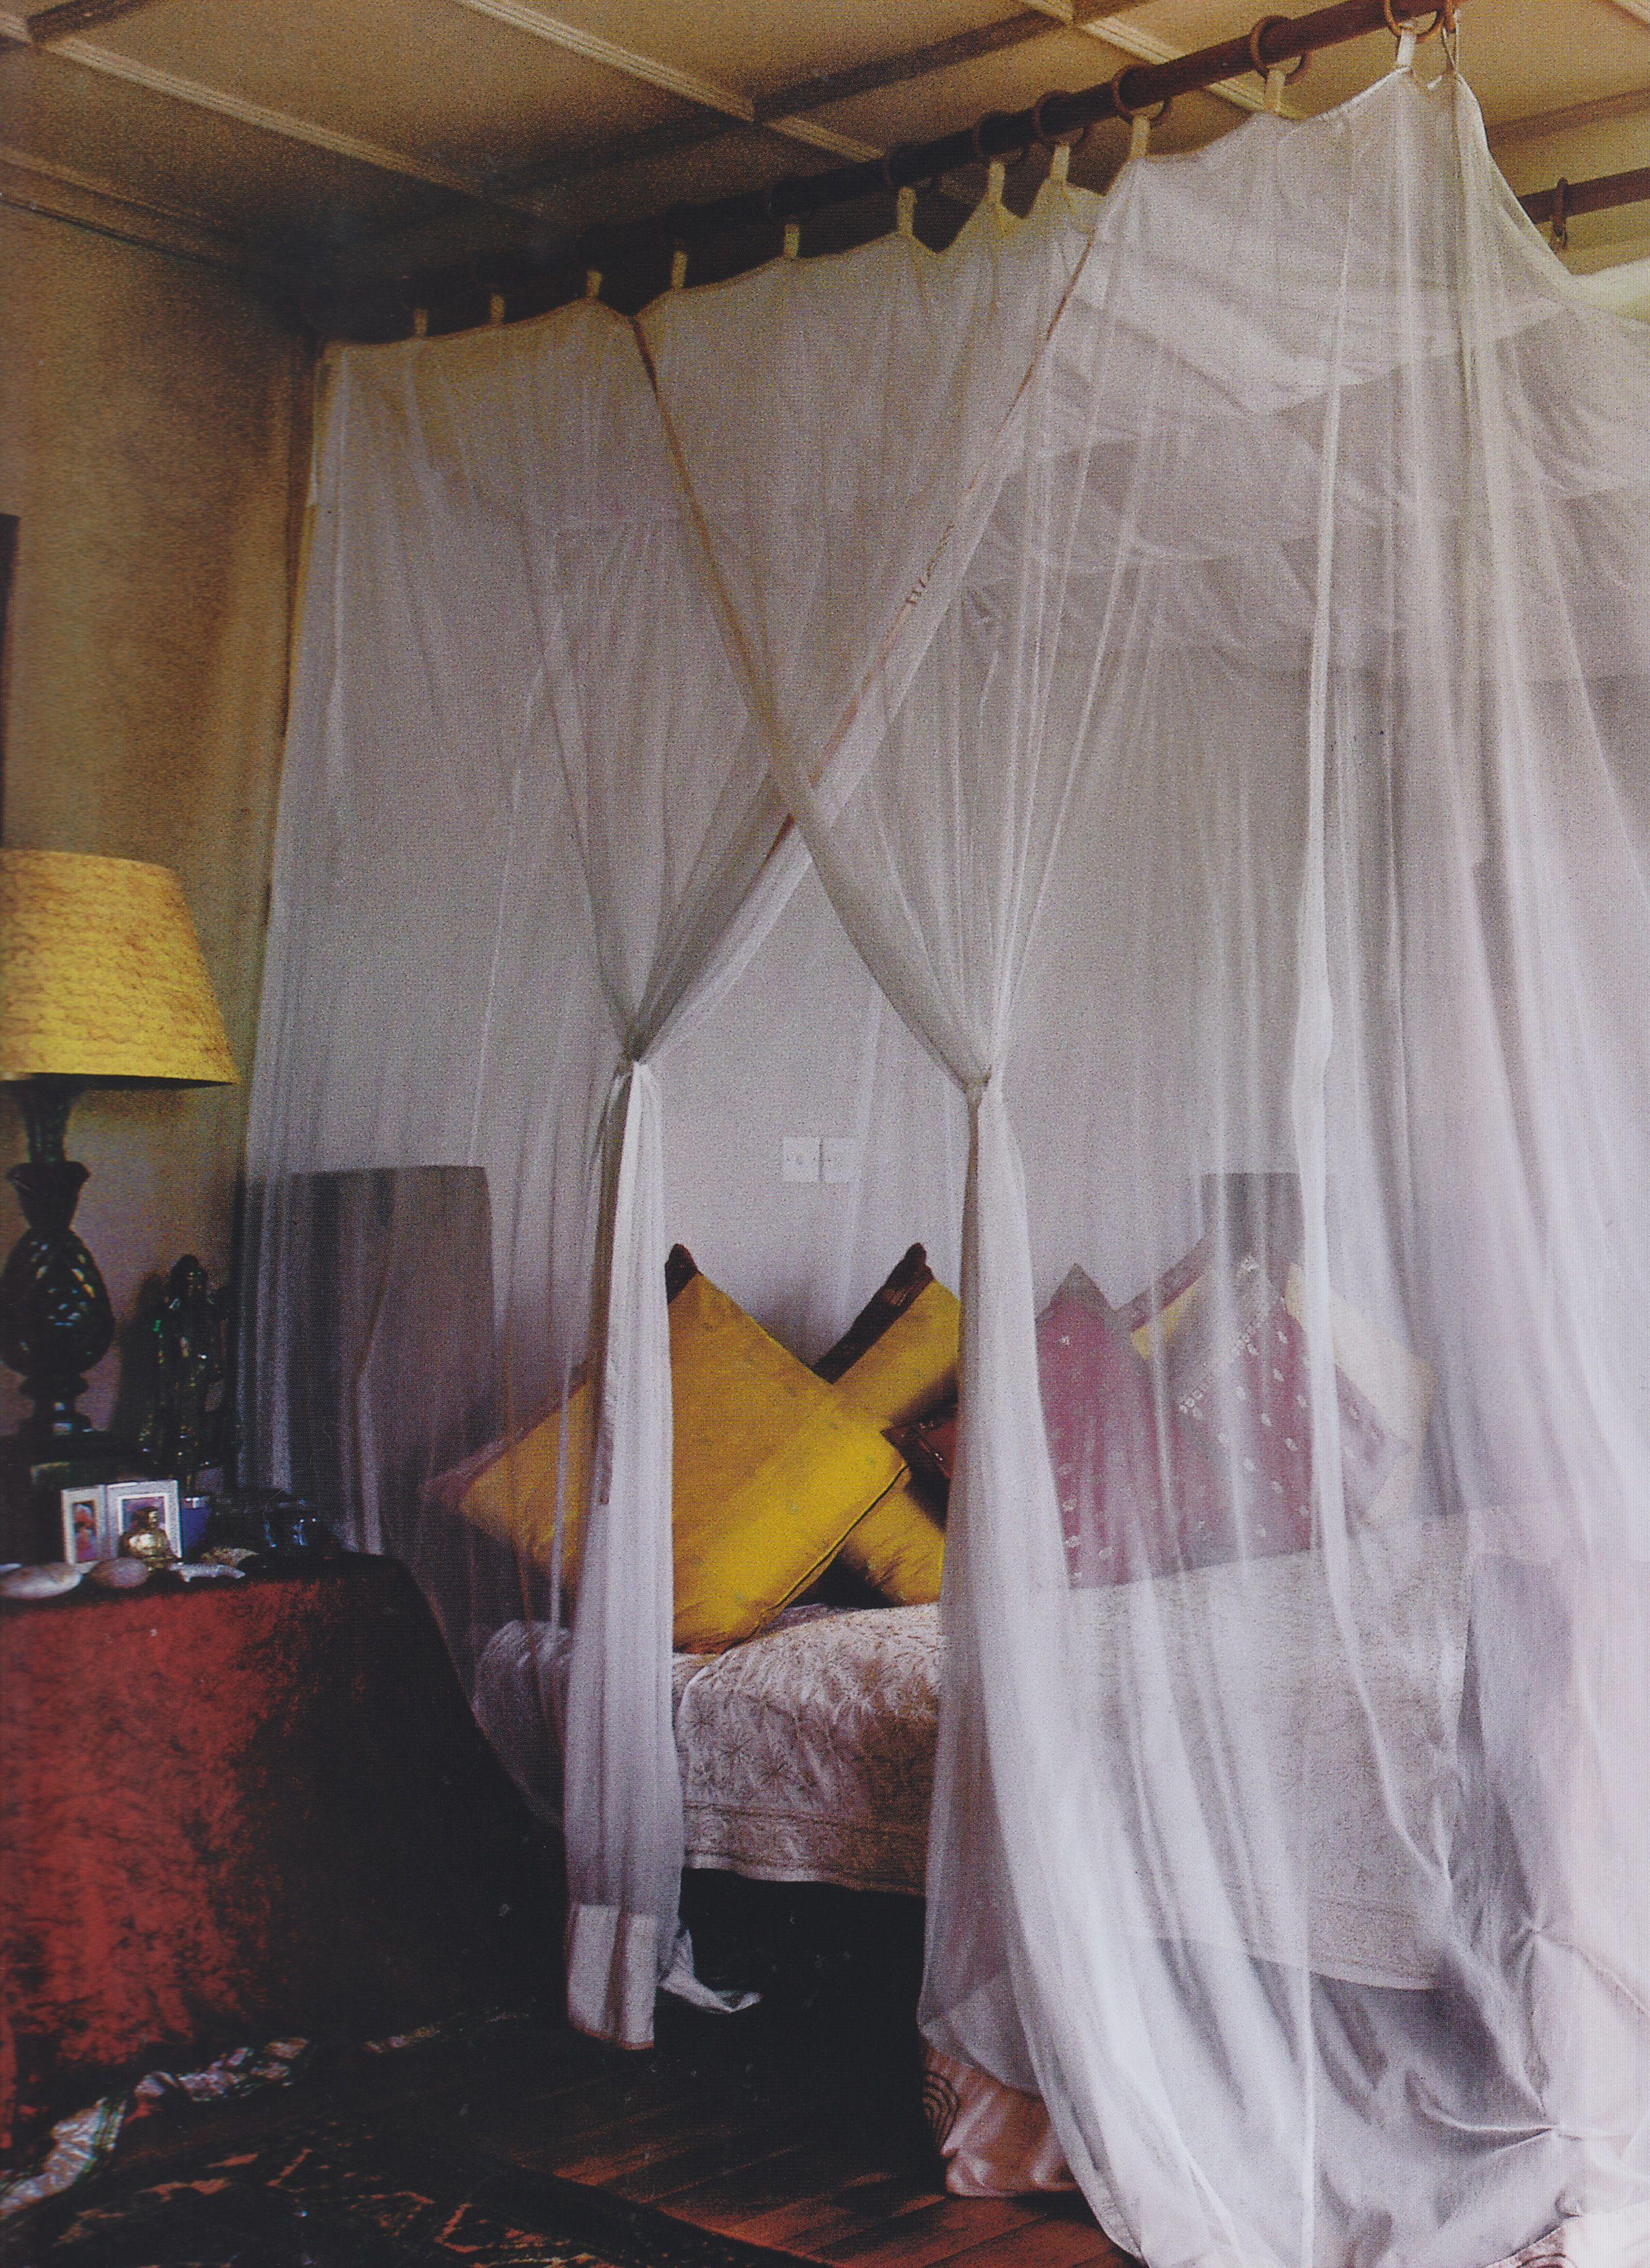 Bedroom Bohemian Bedhanging Bed Hangings Pinterest